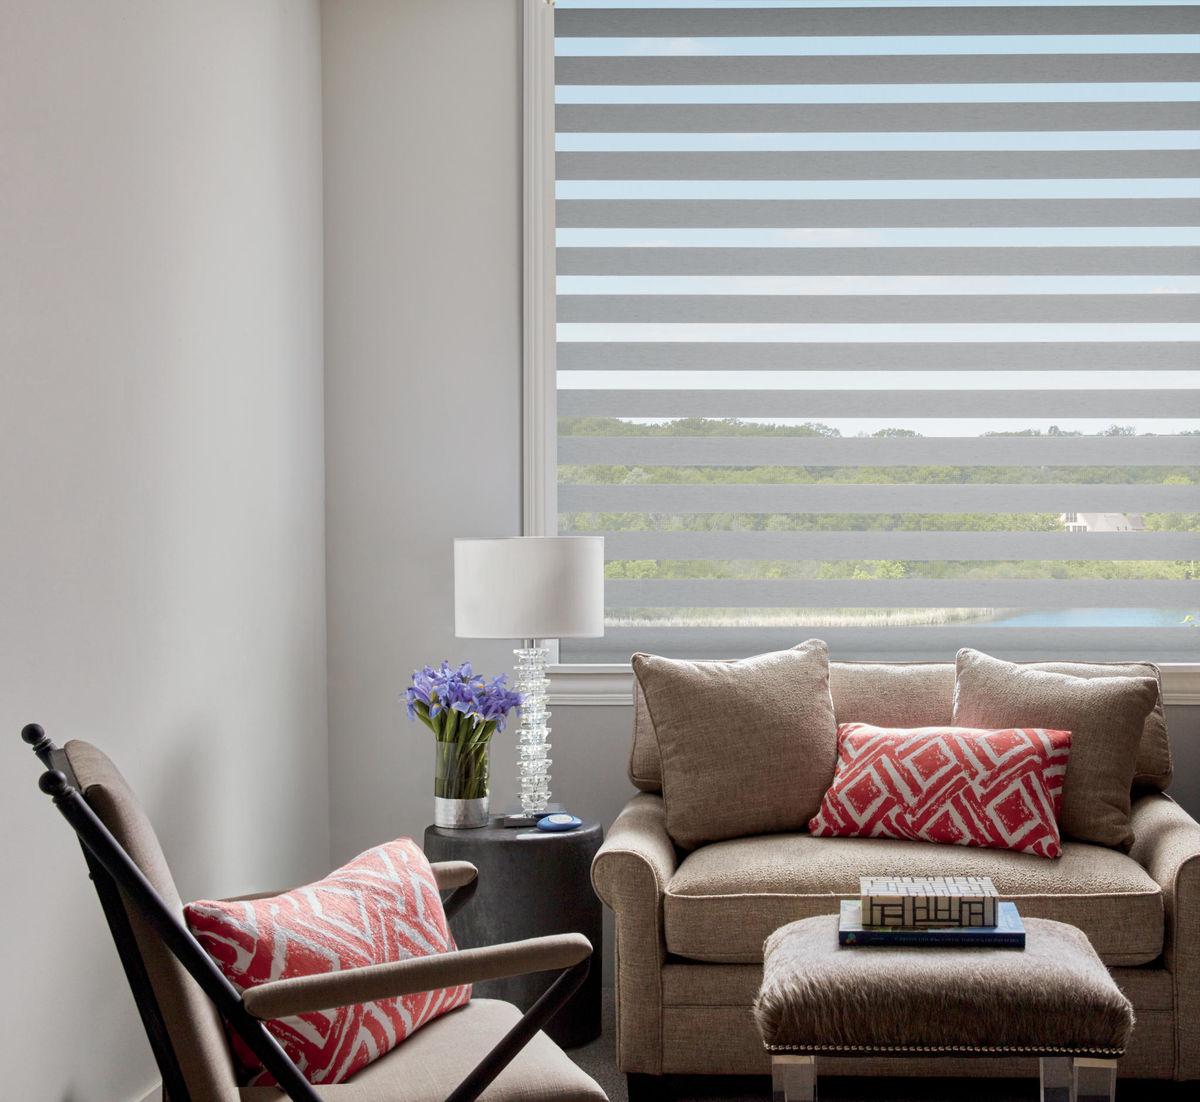 Hunter Douglas blinds in living room | West Michigan Carpet Center